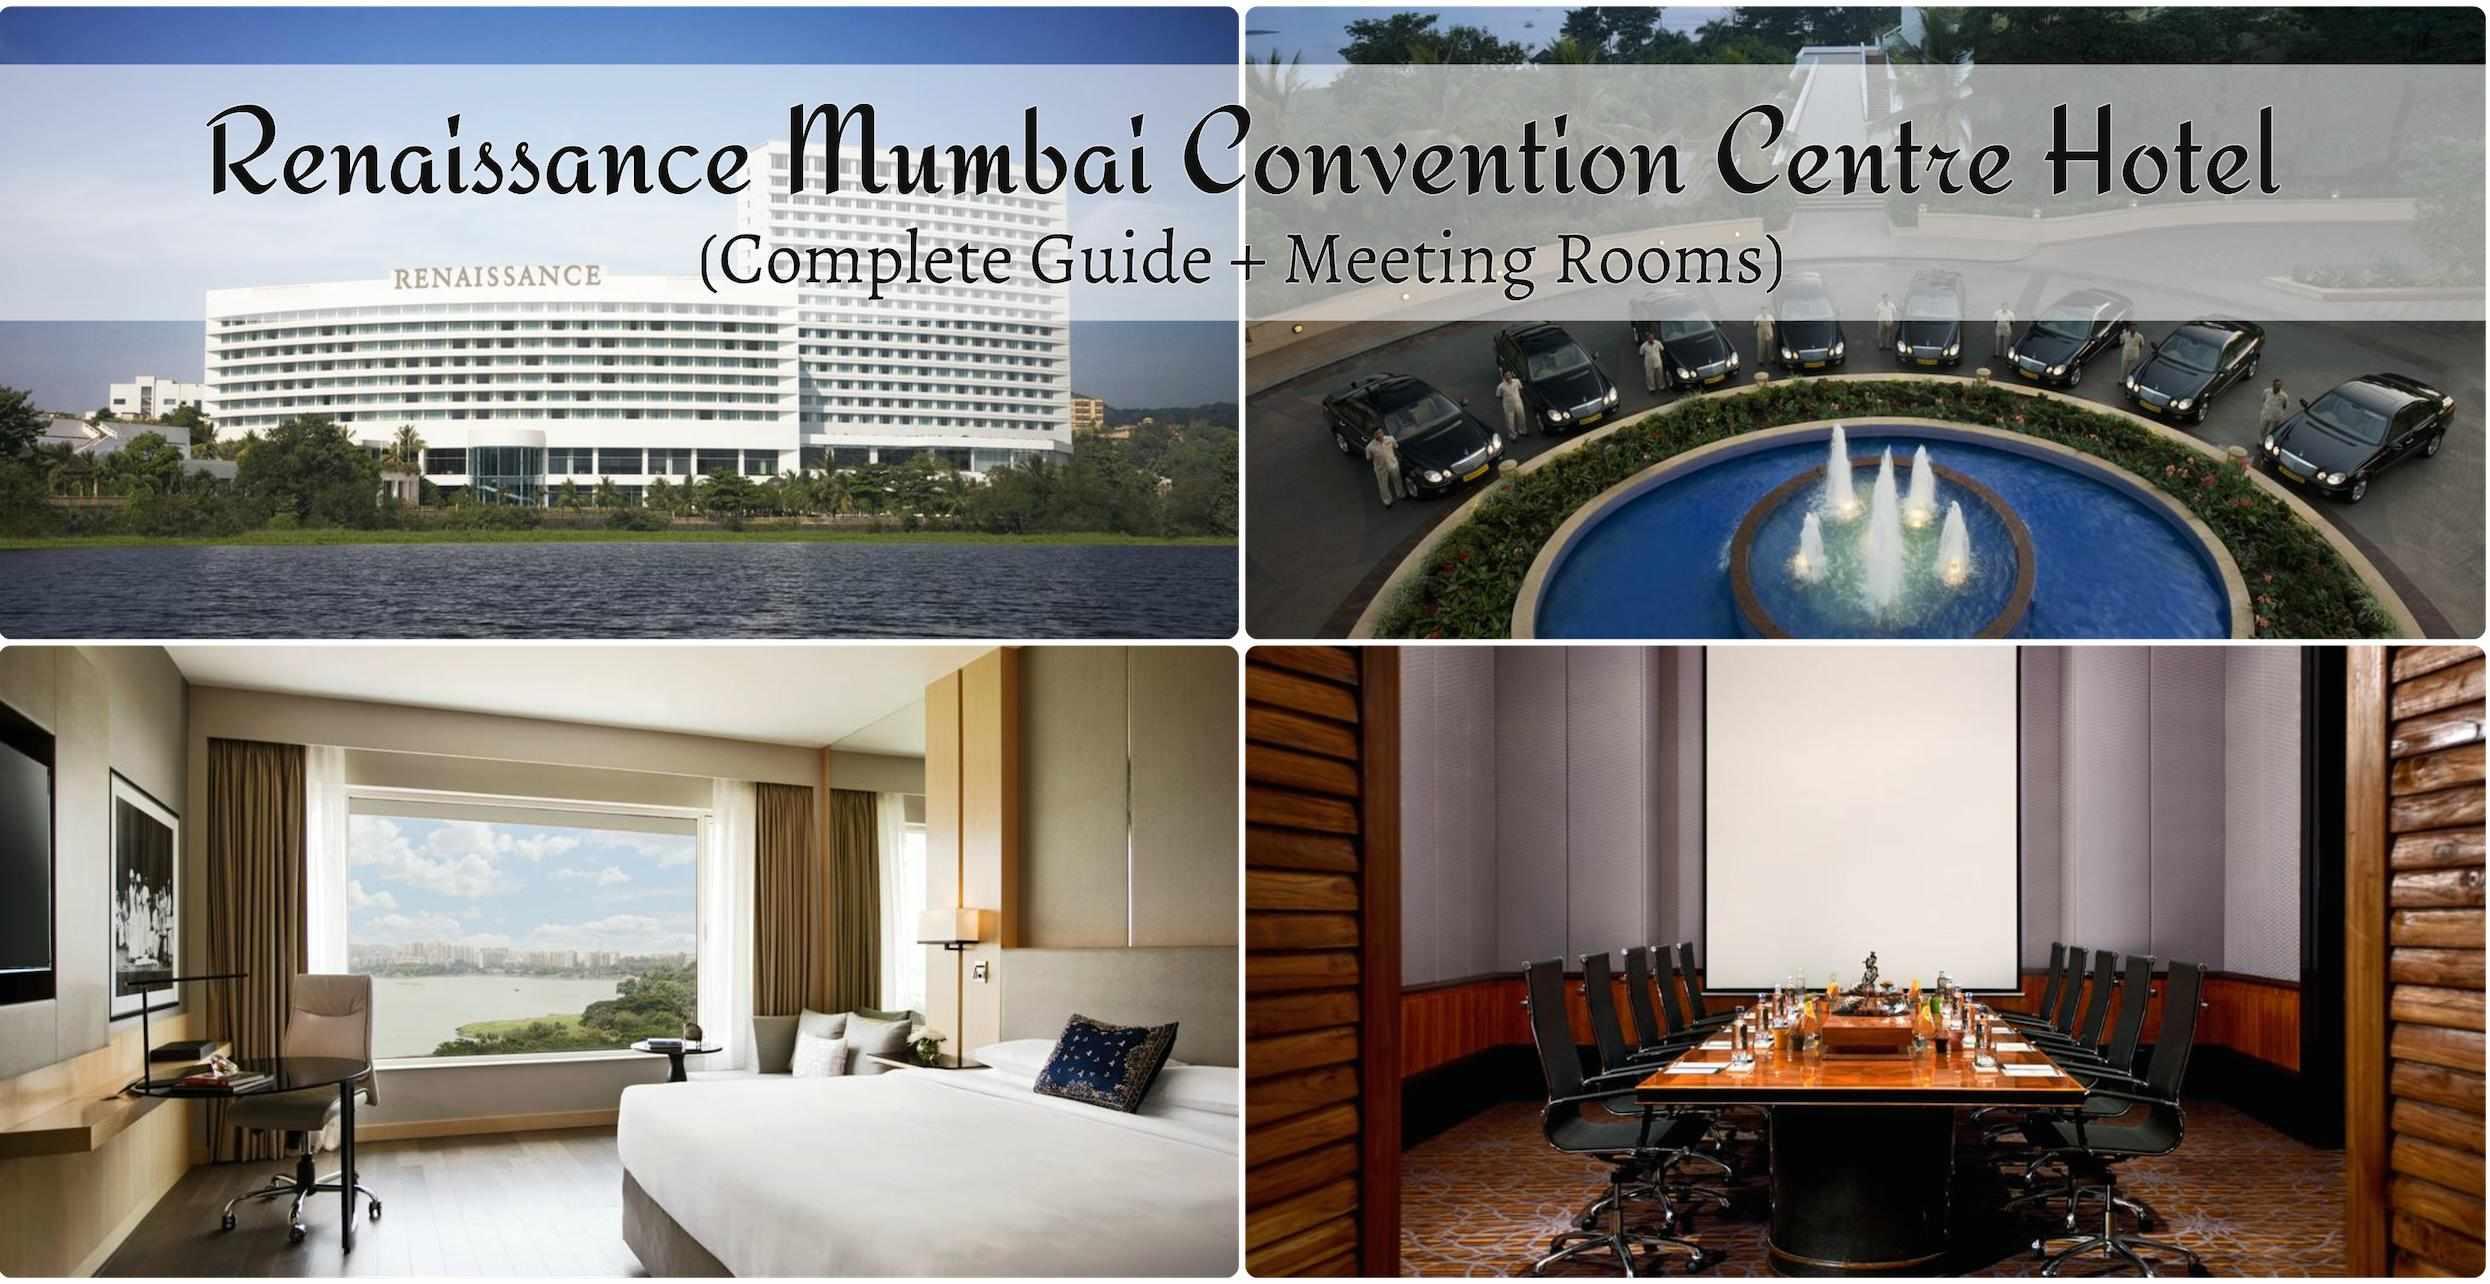 Renaissance-Mumbai-convention-centre-hotel.jpg